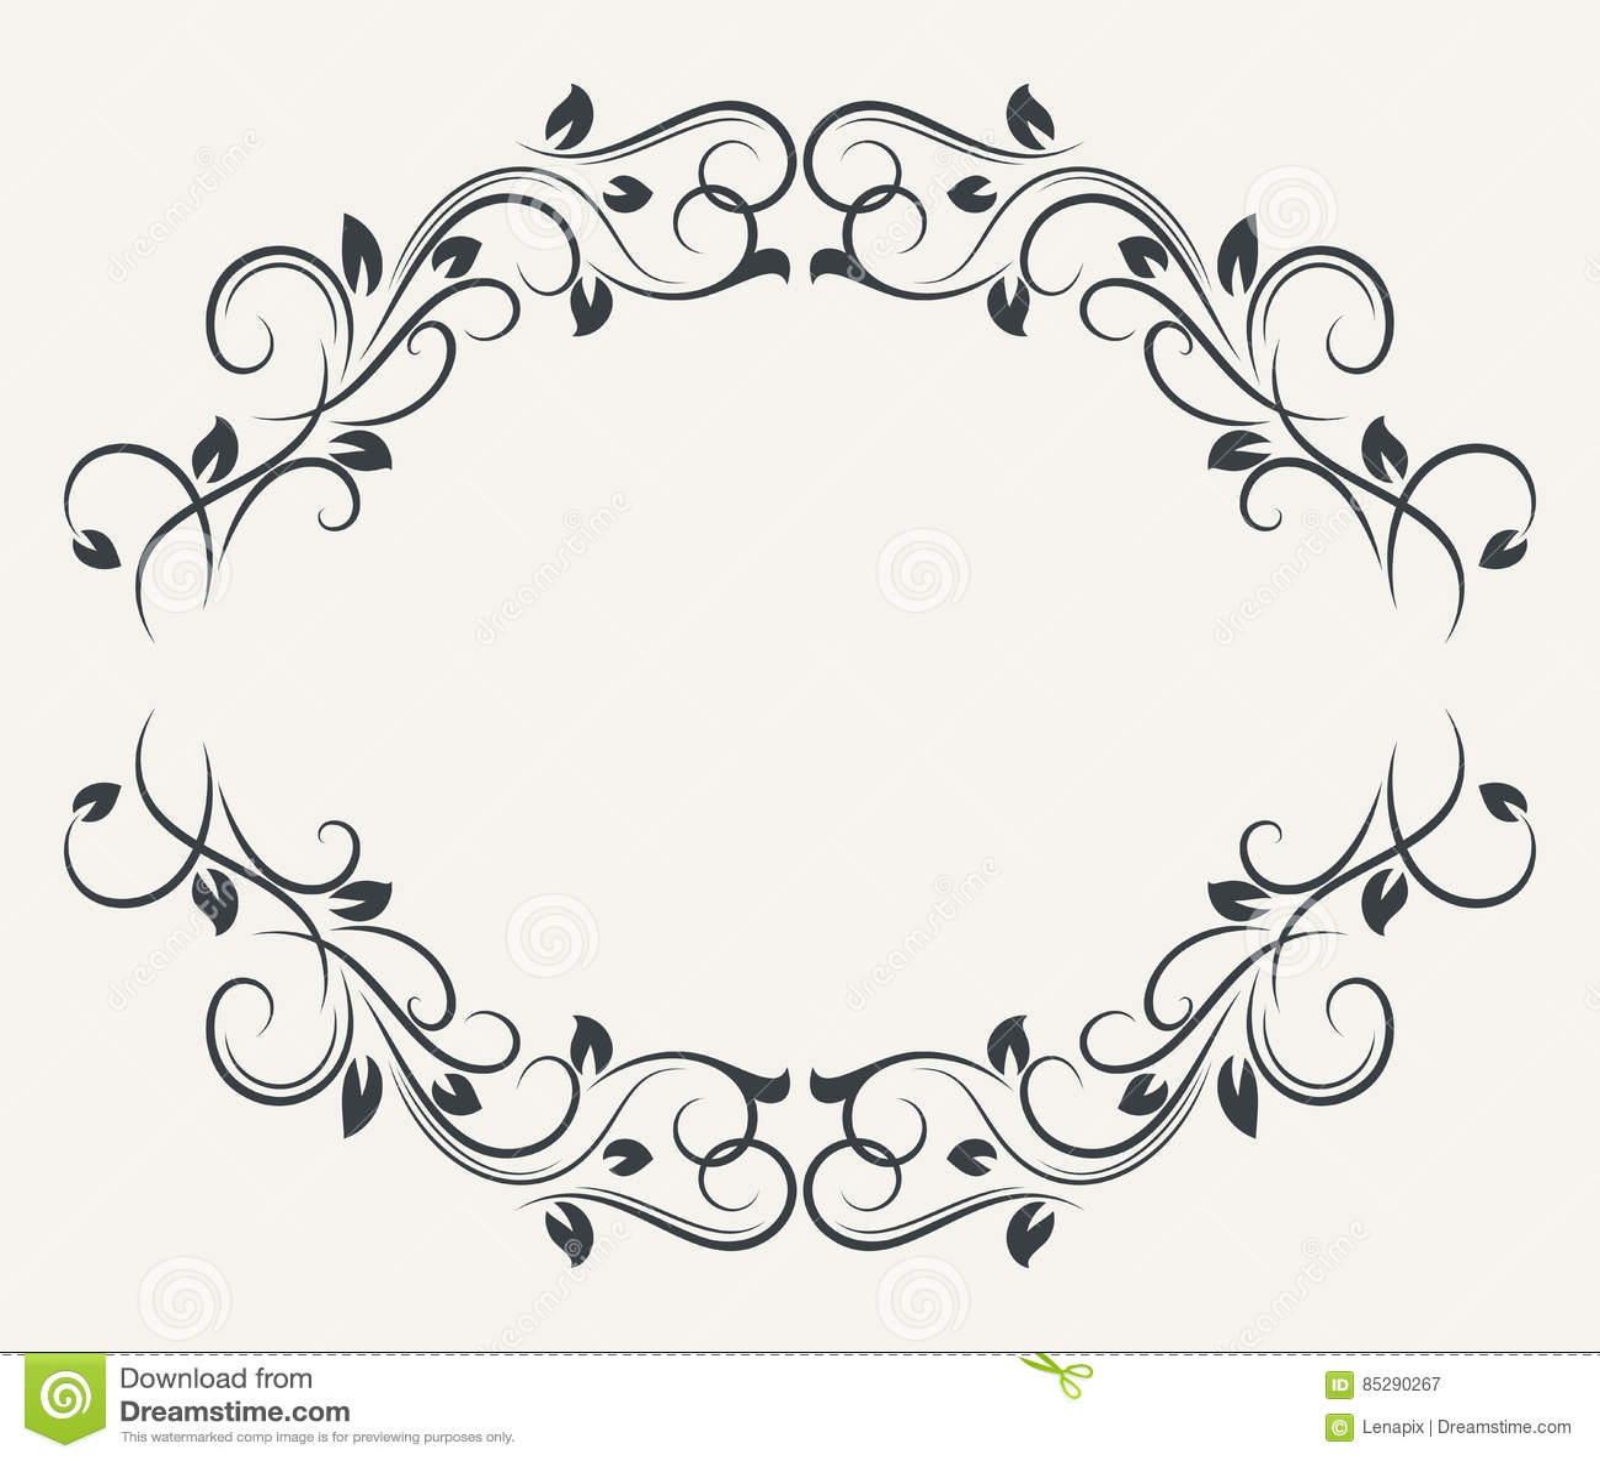 Black And White Floral Frame Stock Vector Illustration